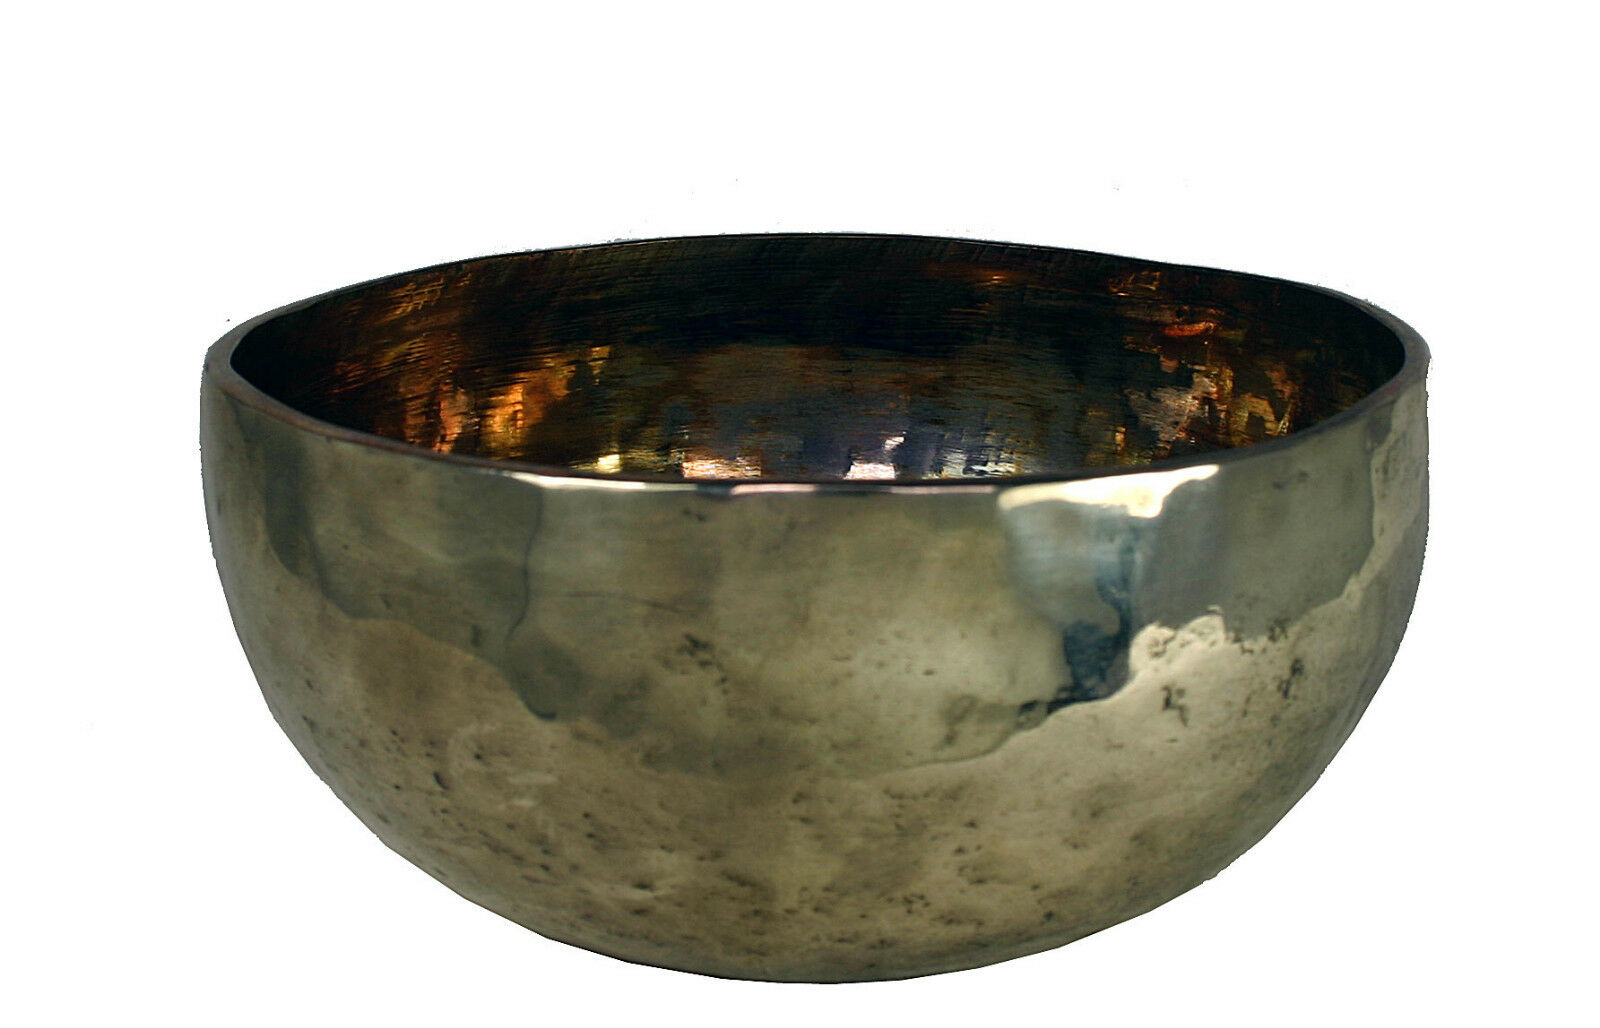 Klangschale Singing Bowl Planetenton Mars + Amor Meditation Hörprobe 613g M72A